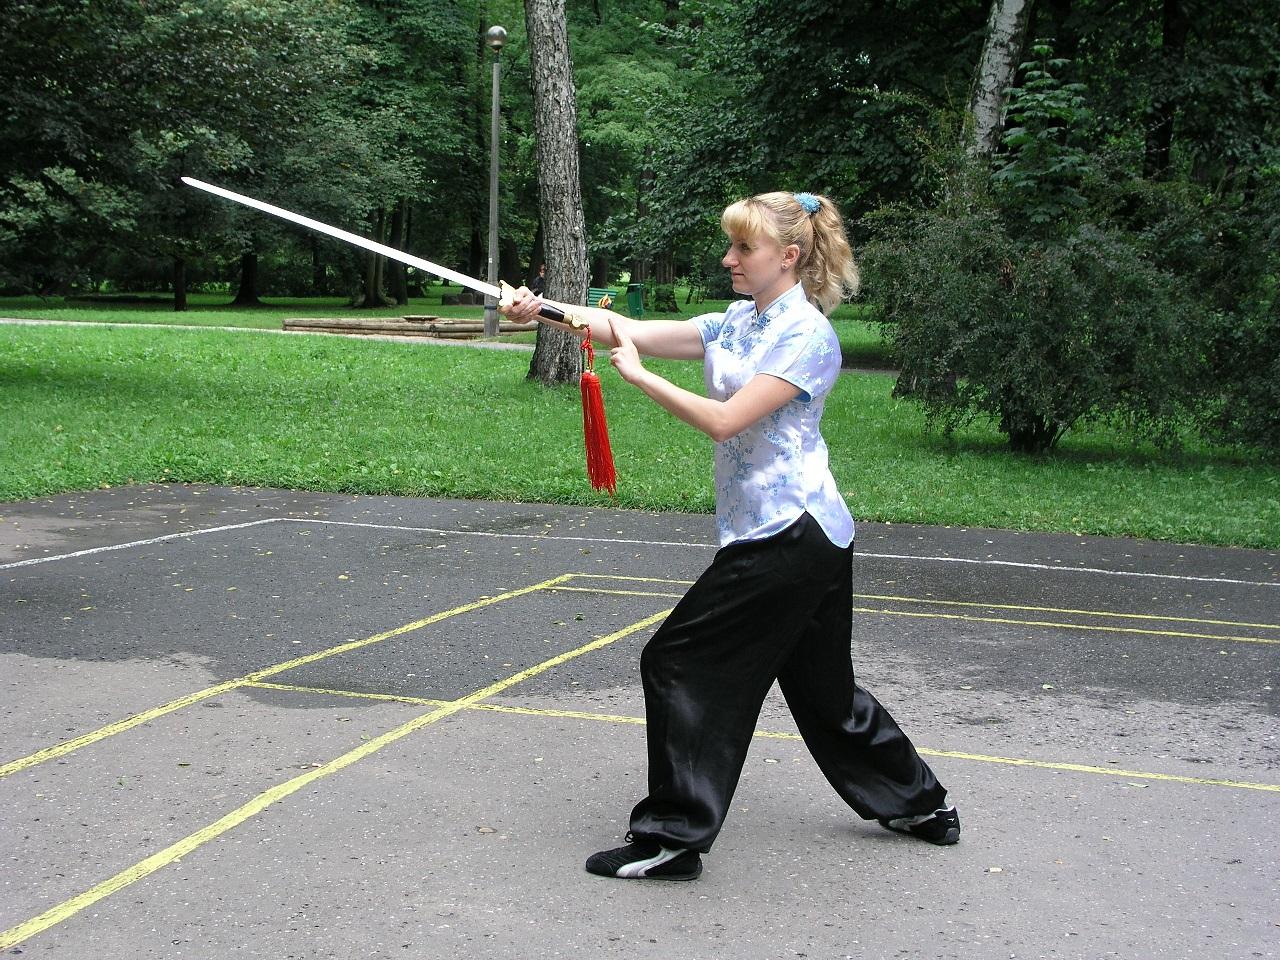 Beata tai chi chuan miecz 1 2004